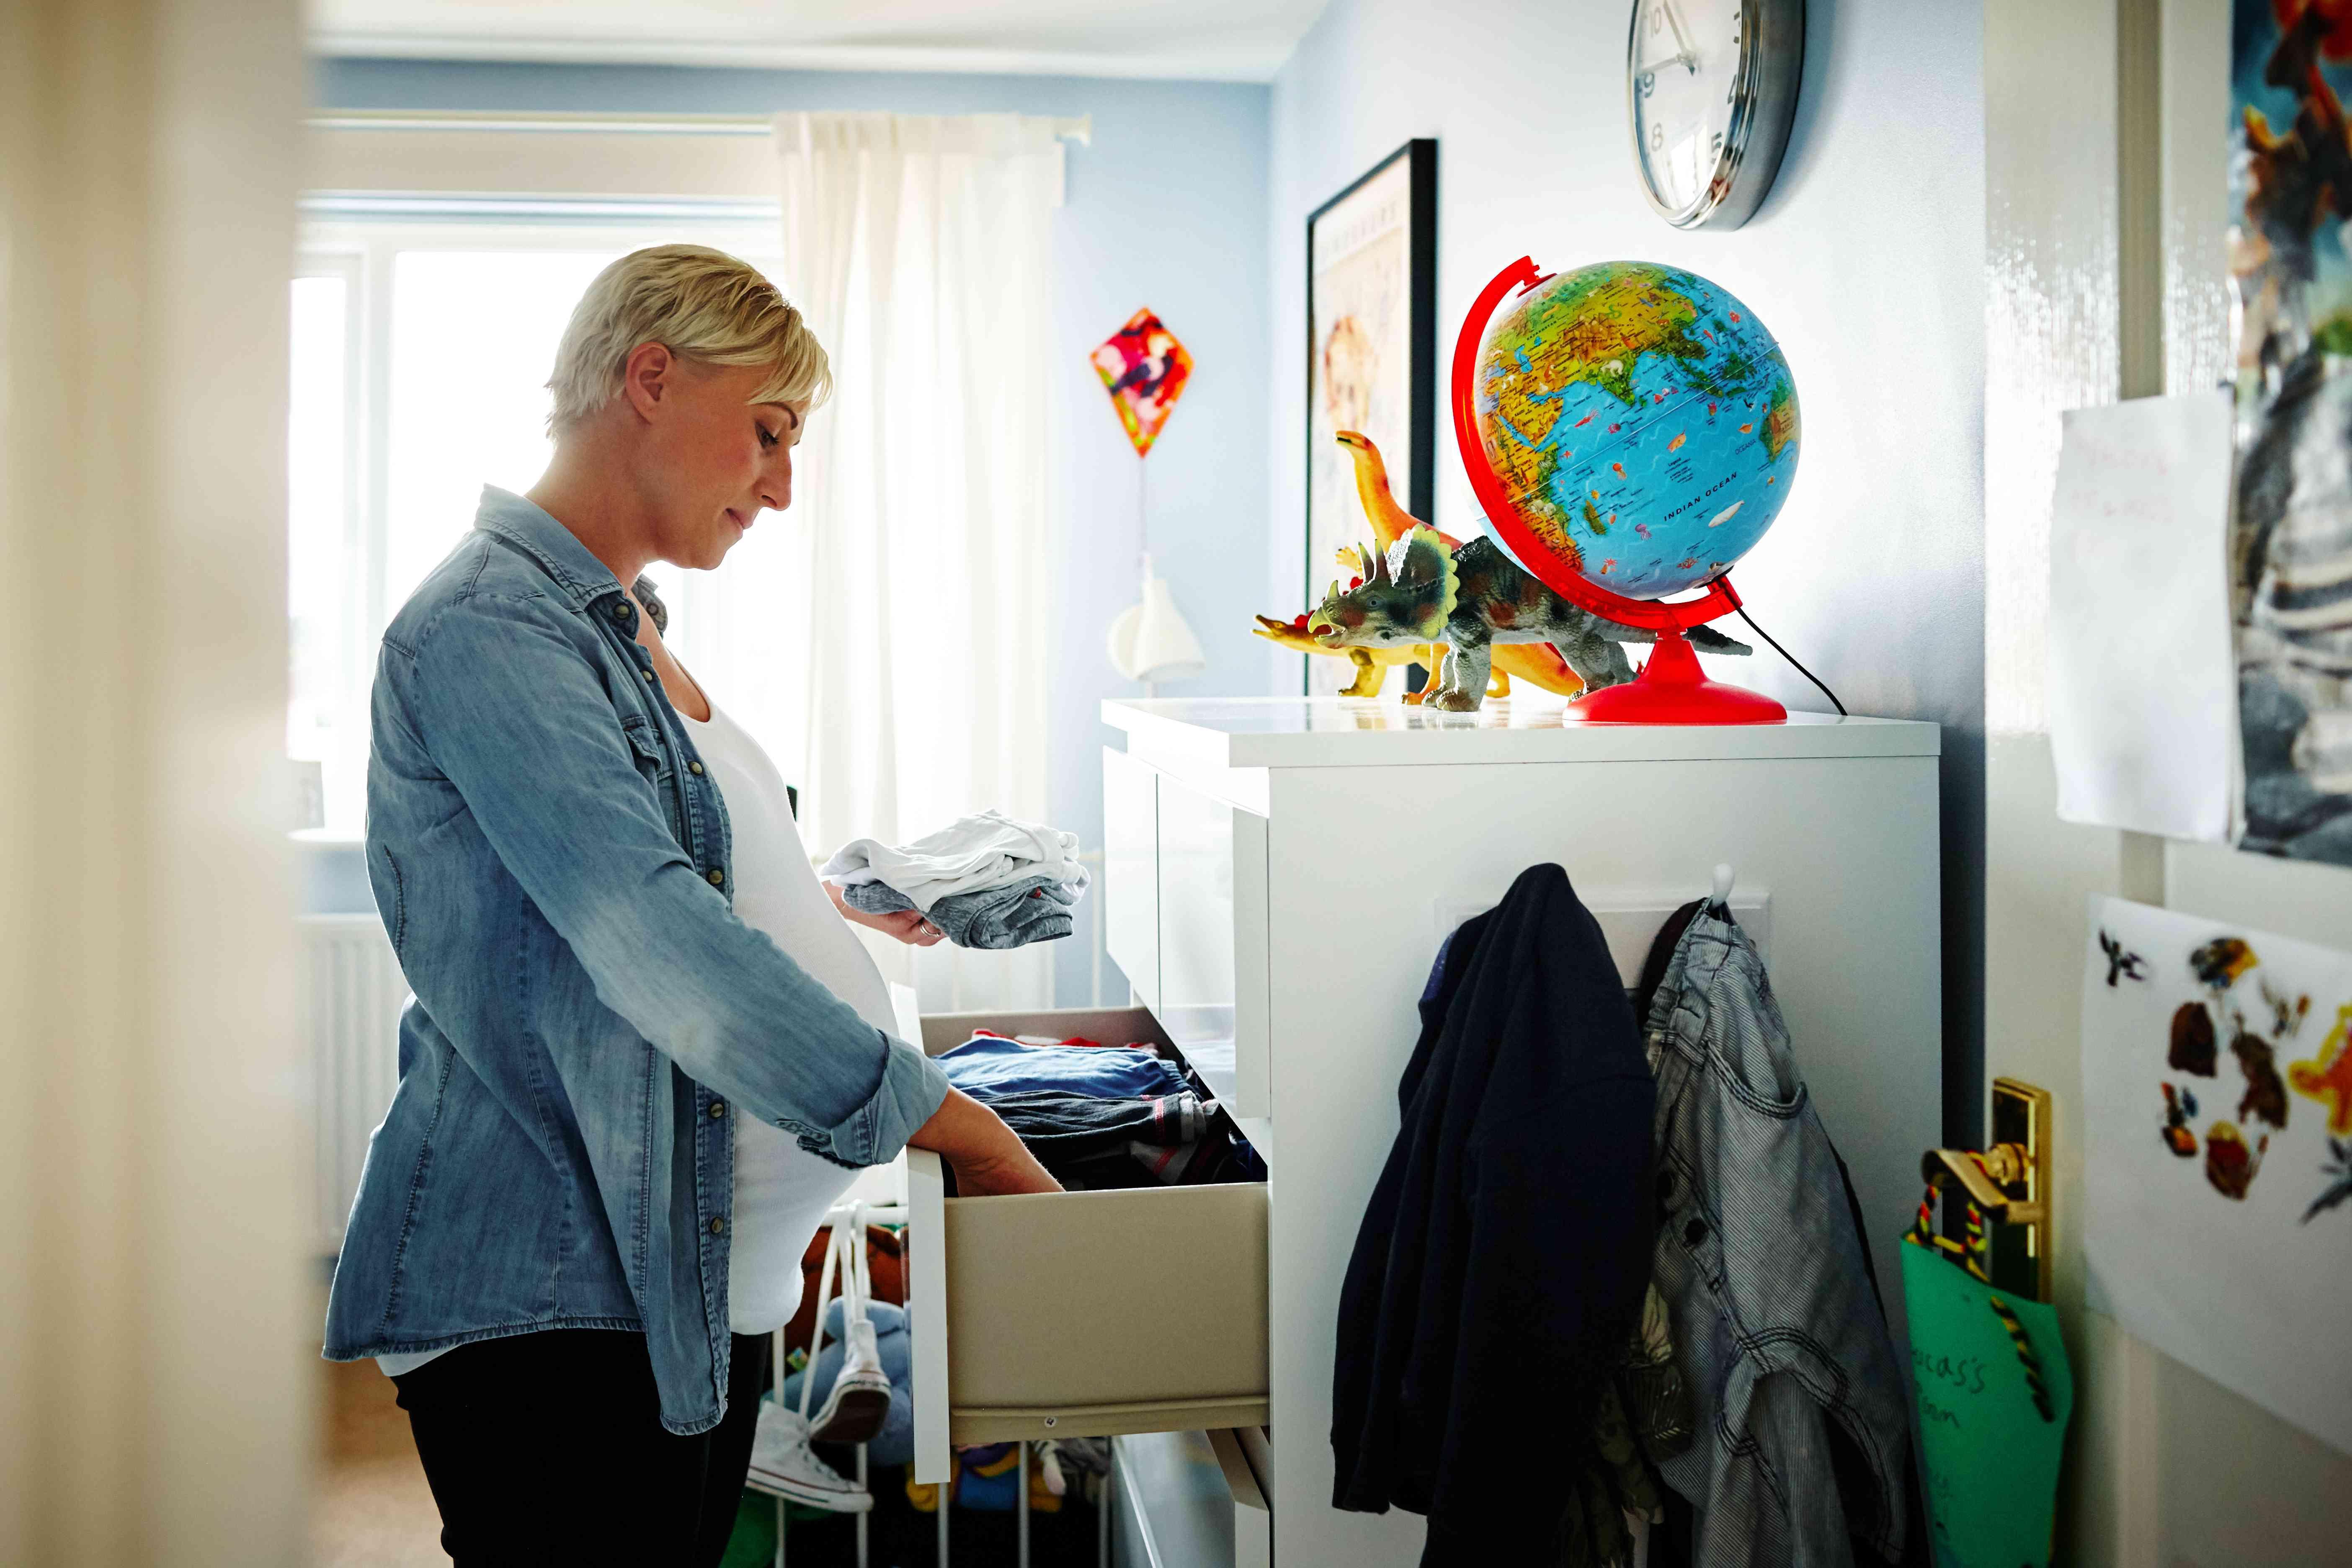 Pregnant woman arranging the wardrobe